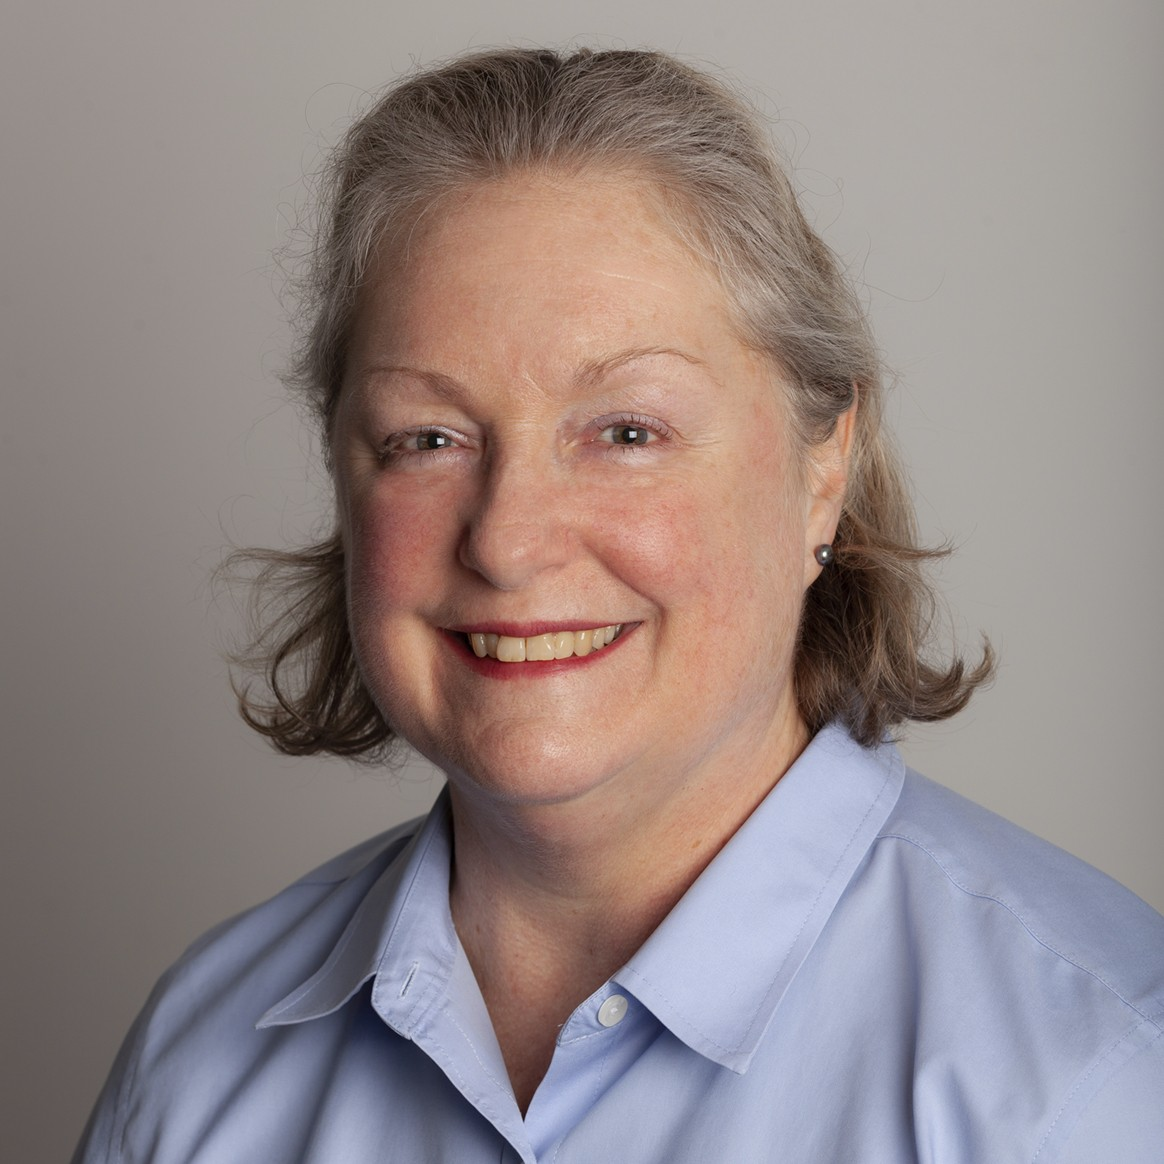 Headshot of Penn State Professor of Voice Jennifer Trost